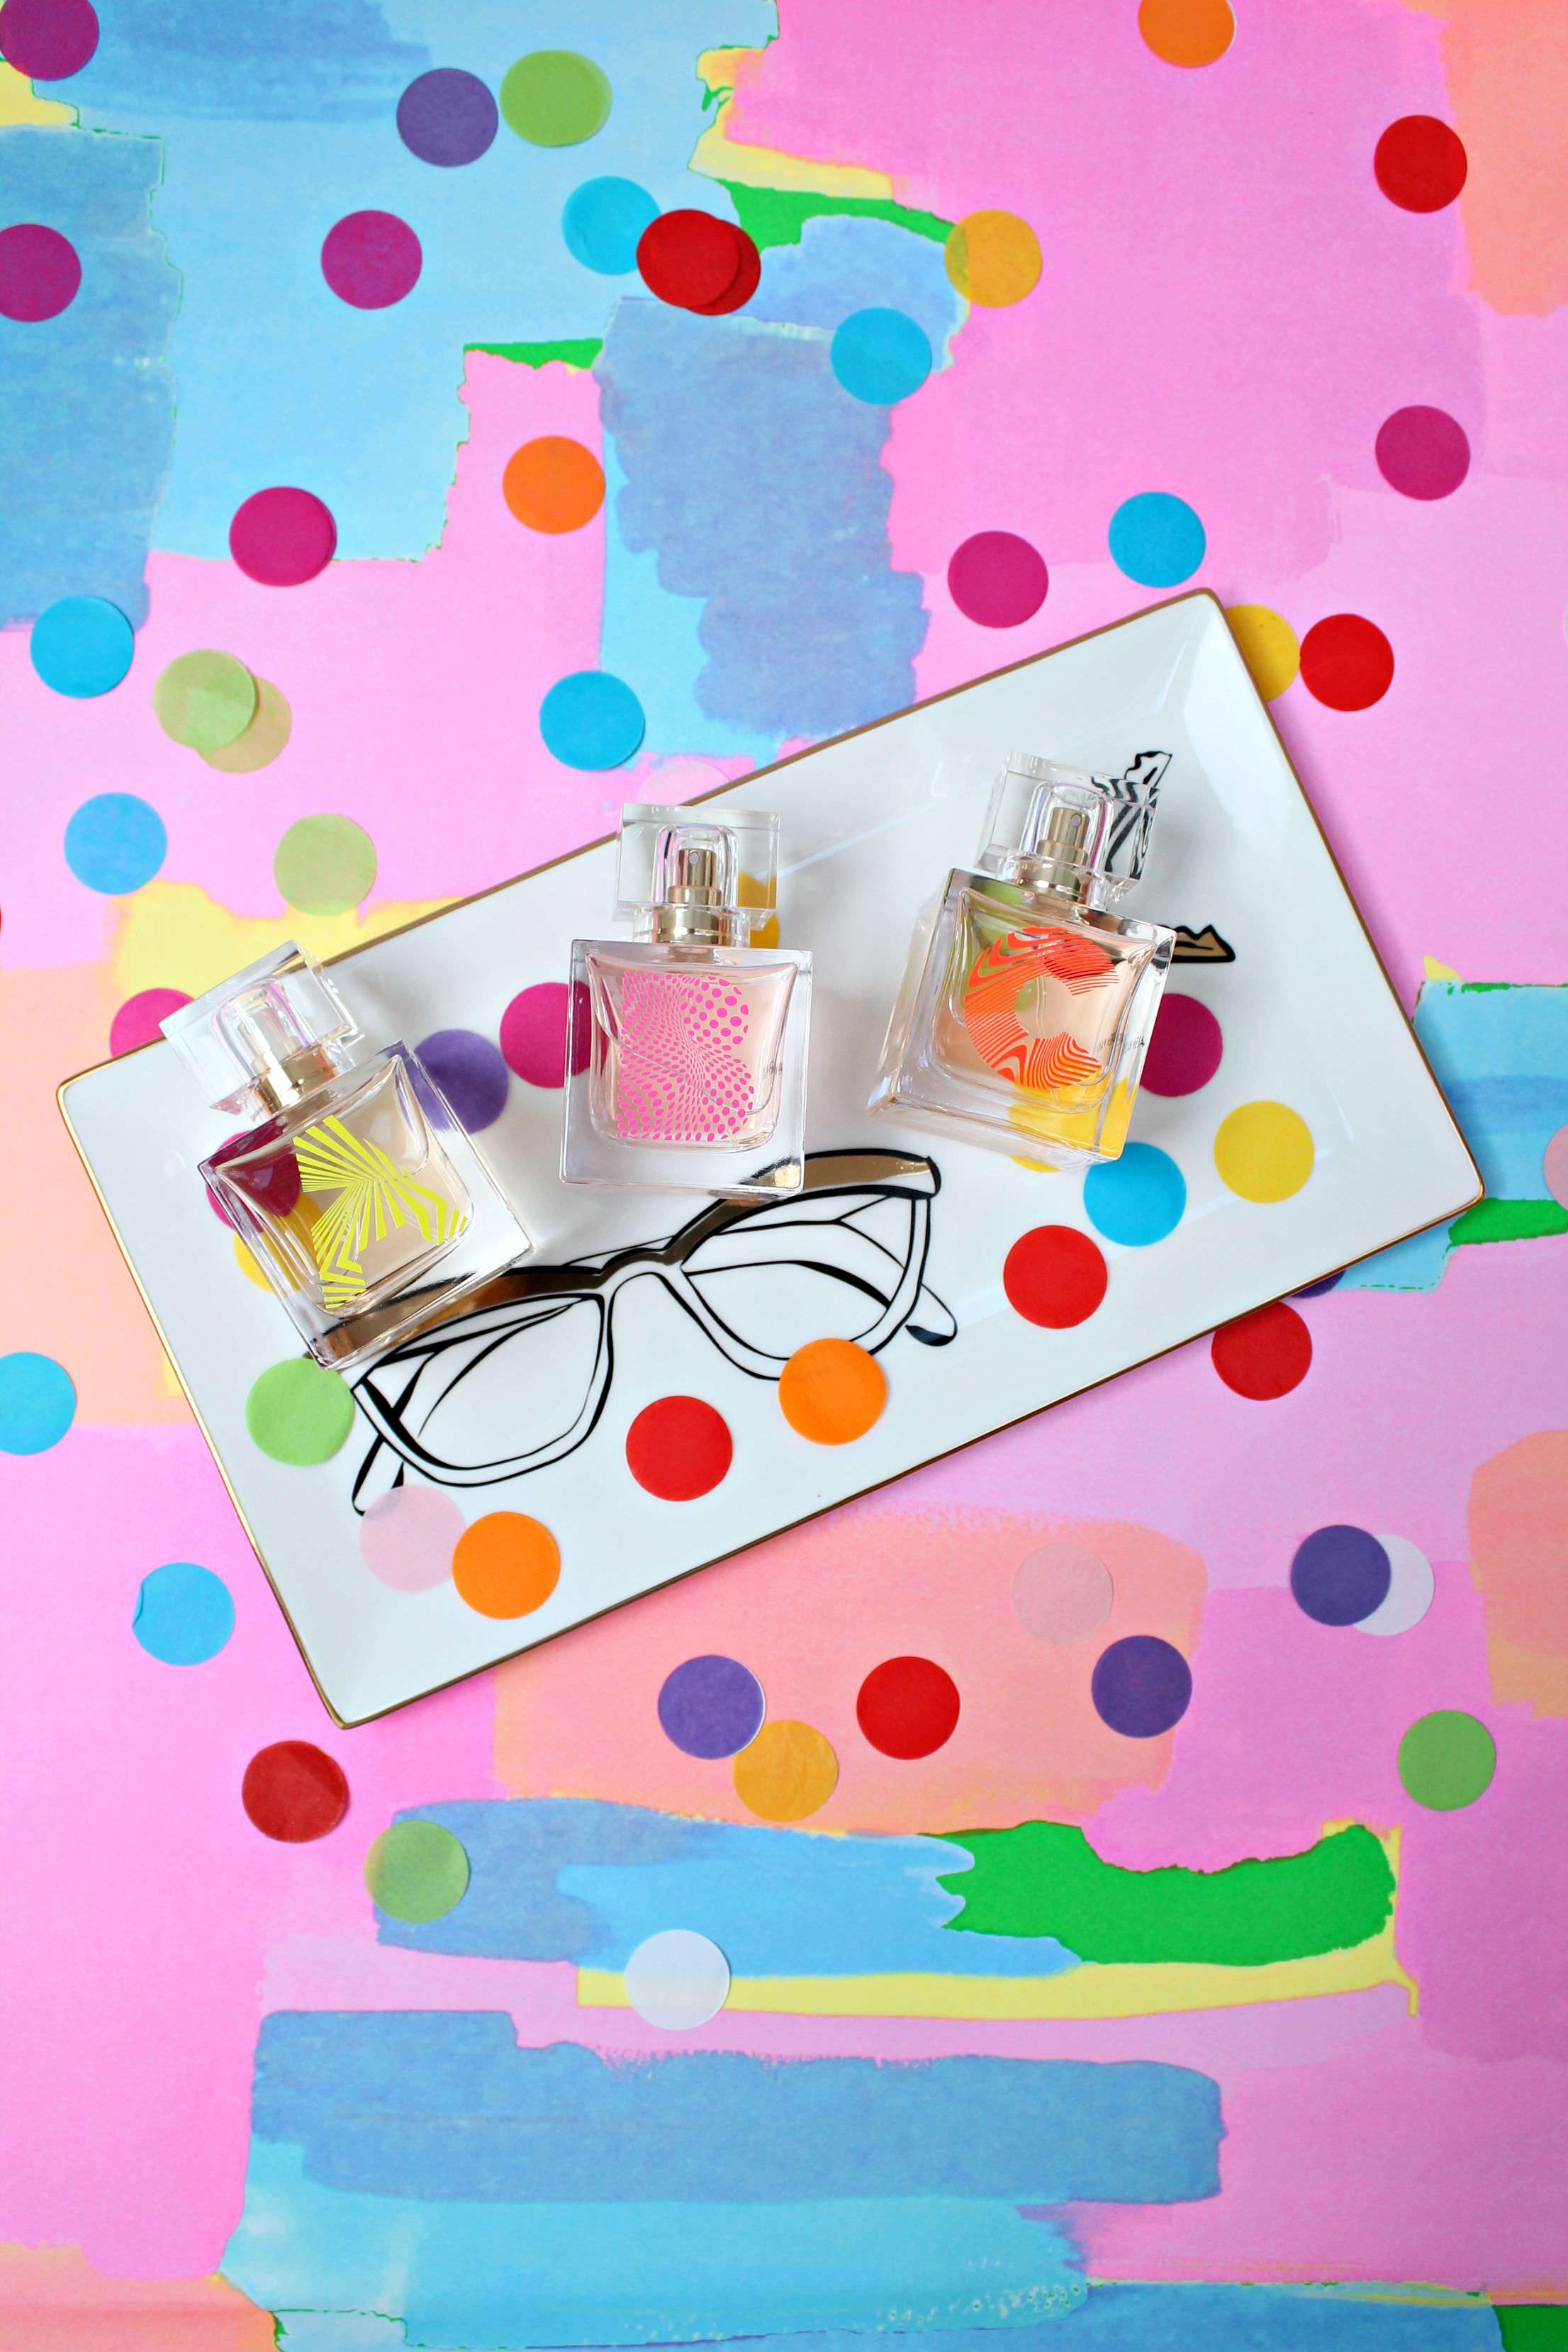 Karen-Walker-perfumes-styling-and-photo-by-Geraldine-Tan-Little-Big-Bell